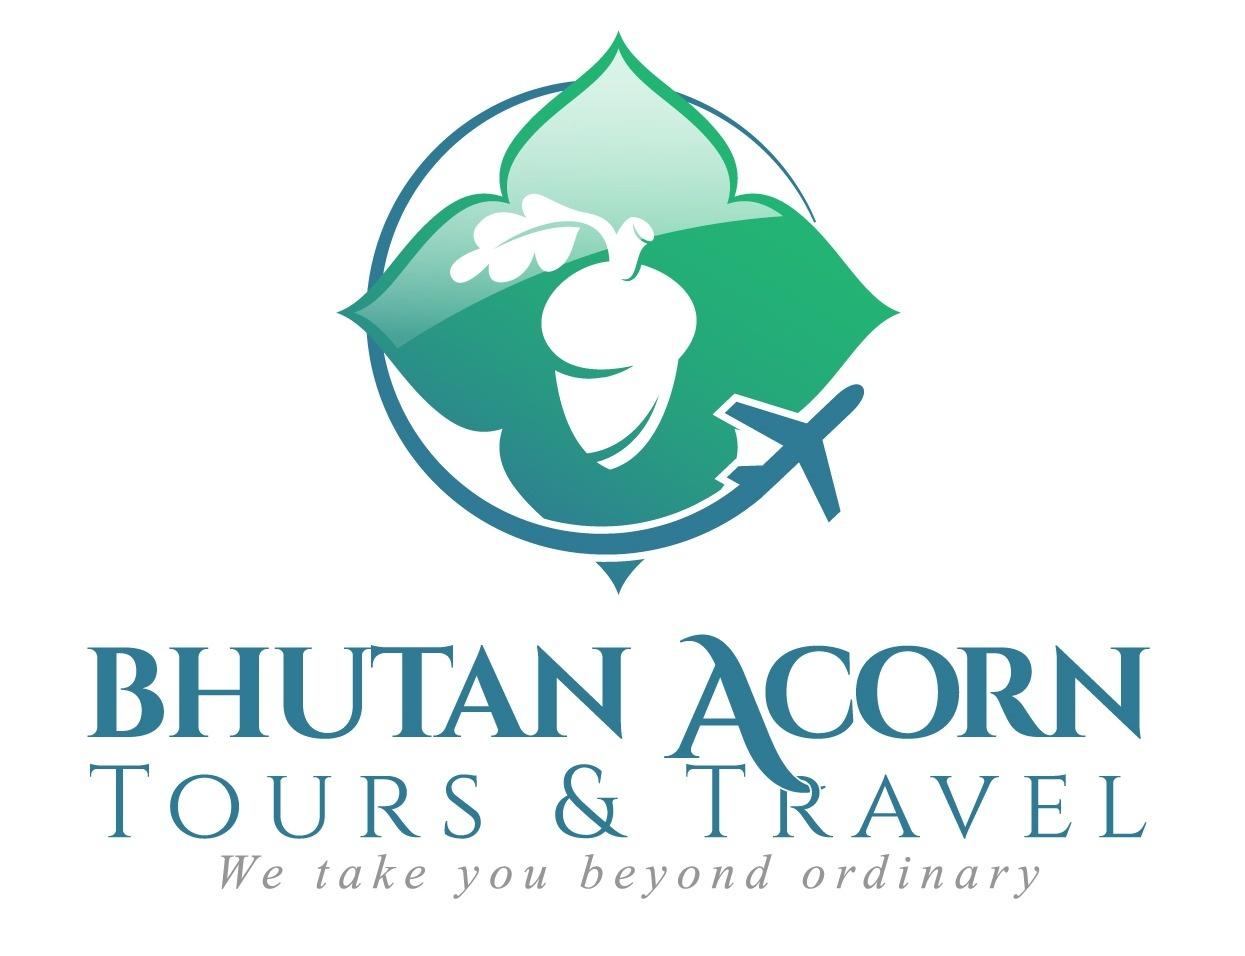 Bhutan Acorn Tours & Travel